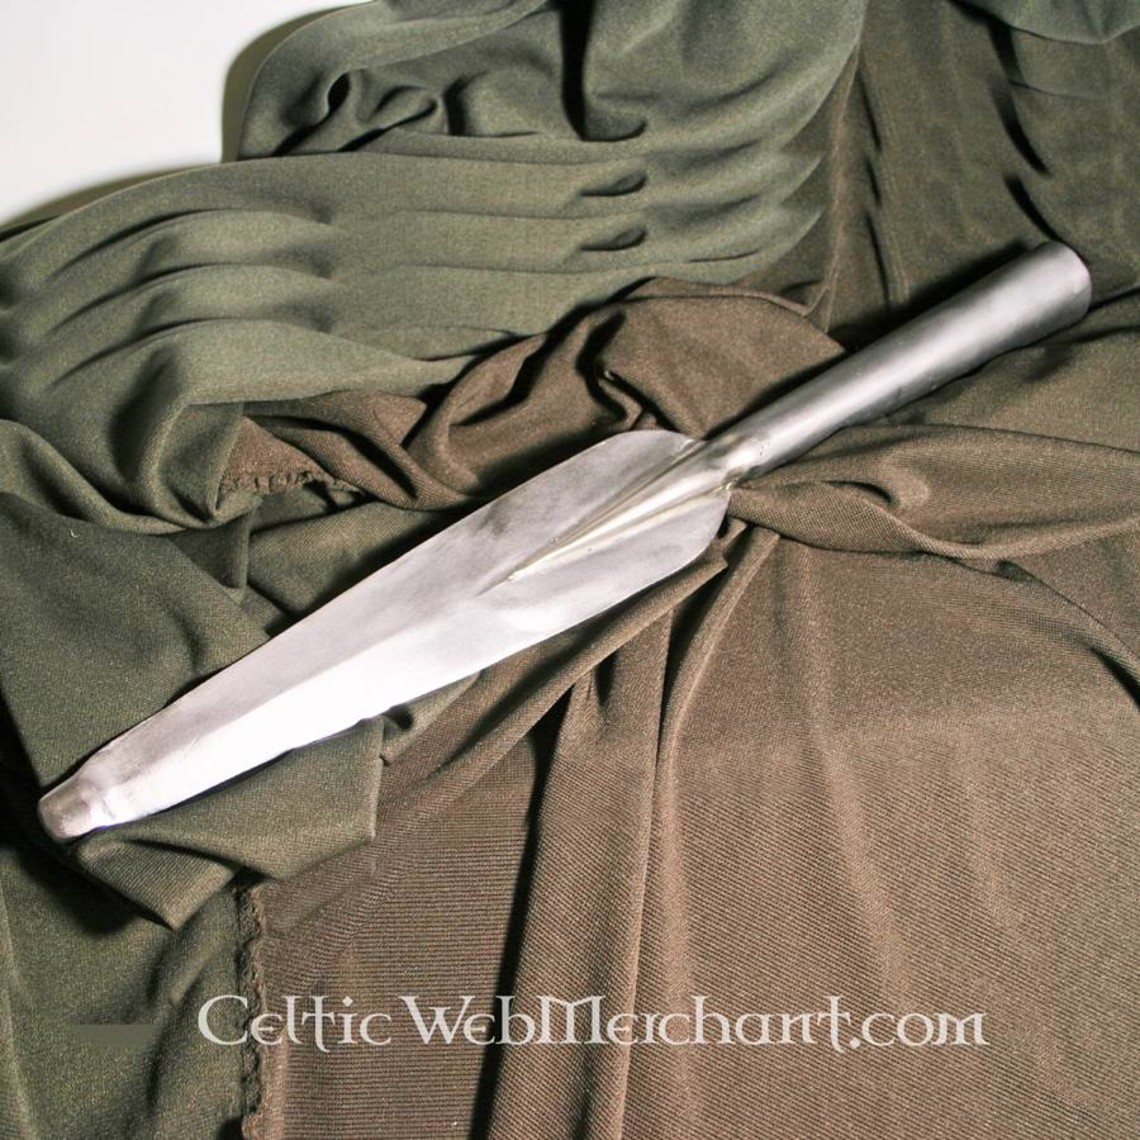 Marshal Historical Punta de lanza Battle-ready, 37,5 cm